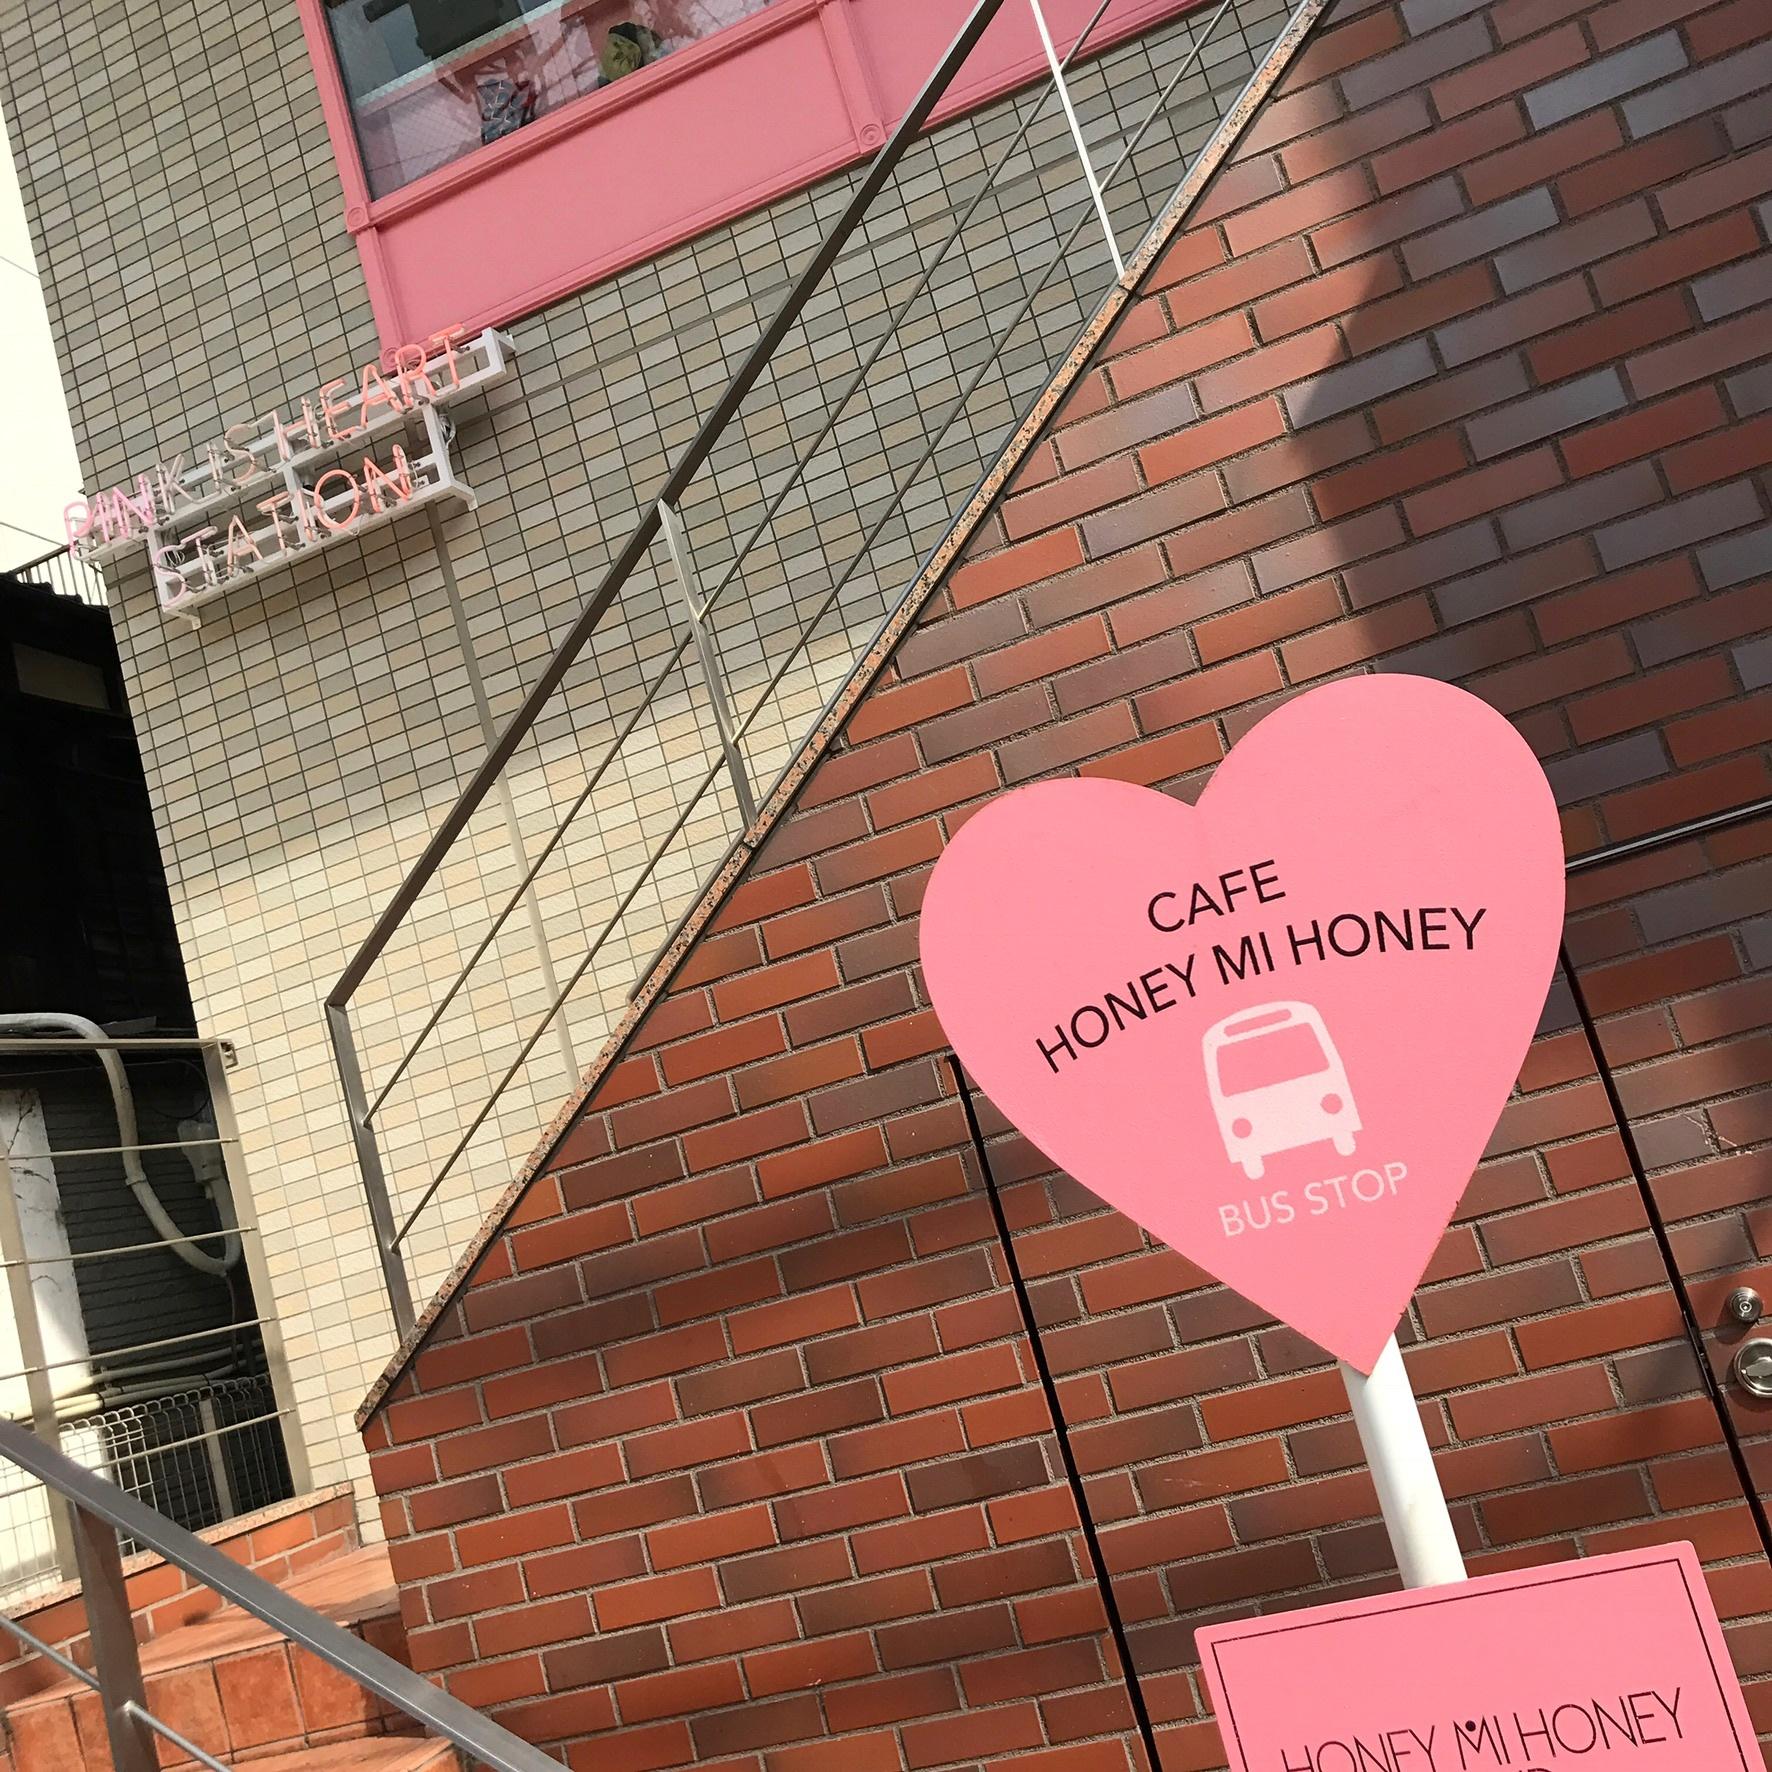 Vol.43♡ CAFE HONEY MI HONEYの《ホワイトデー限定メニュー》❤︎_1_1